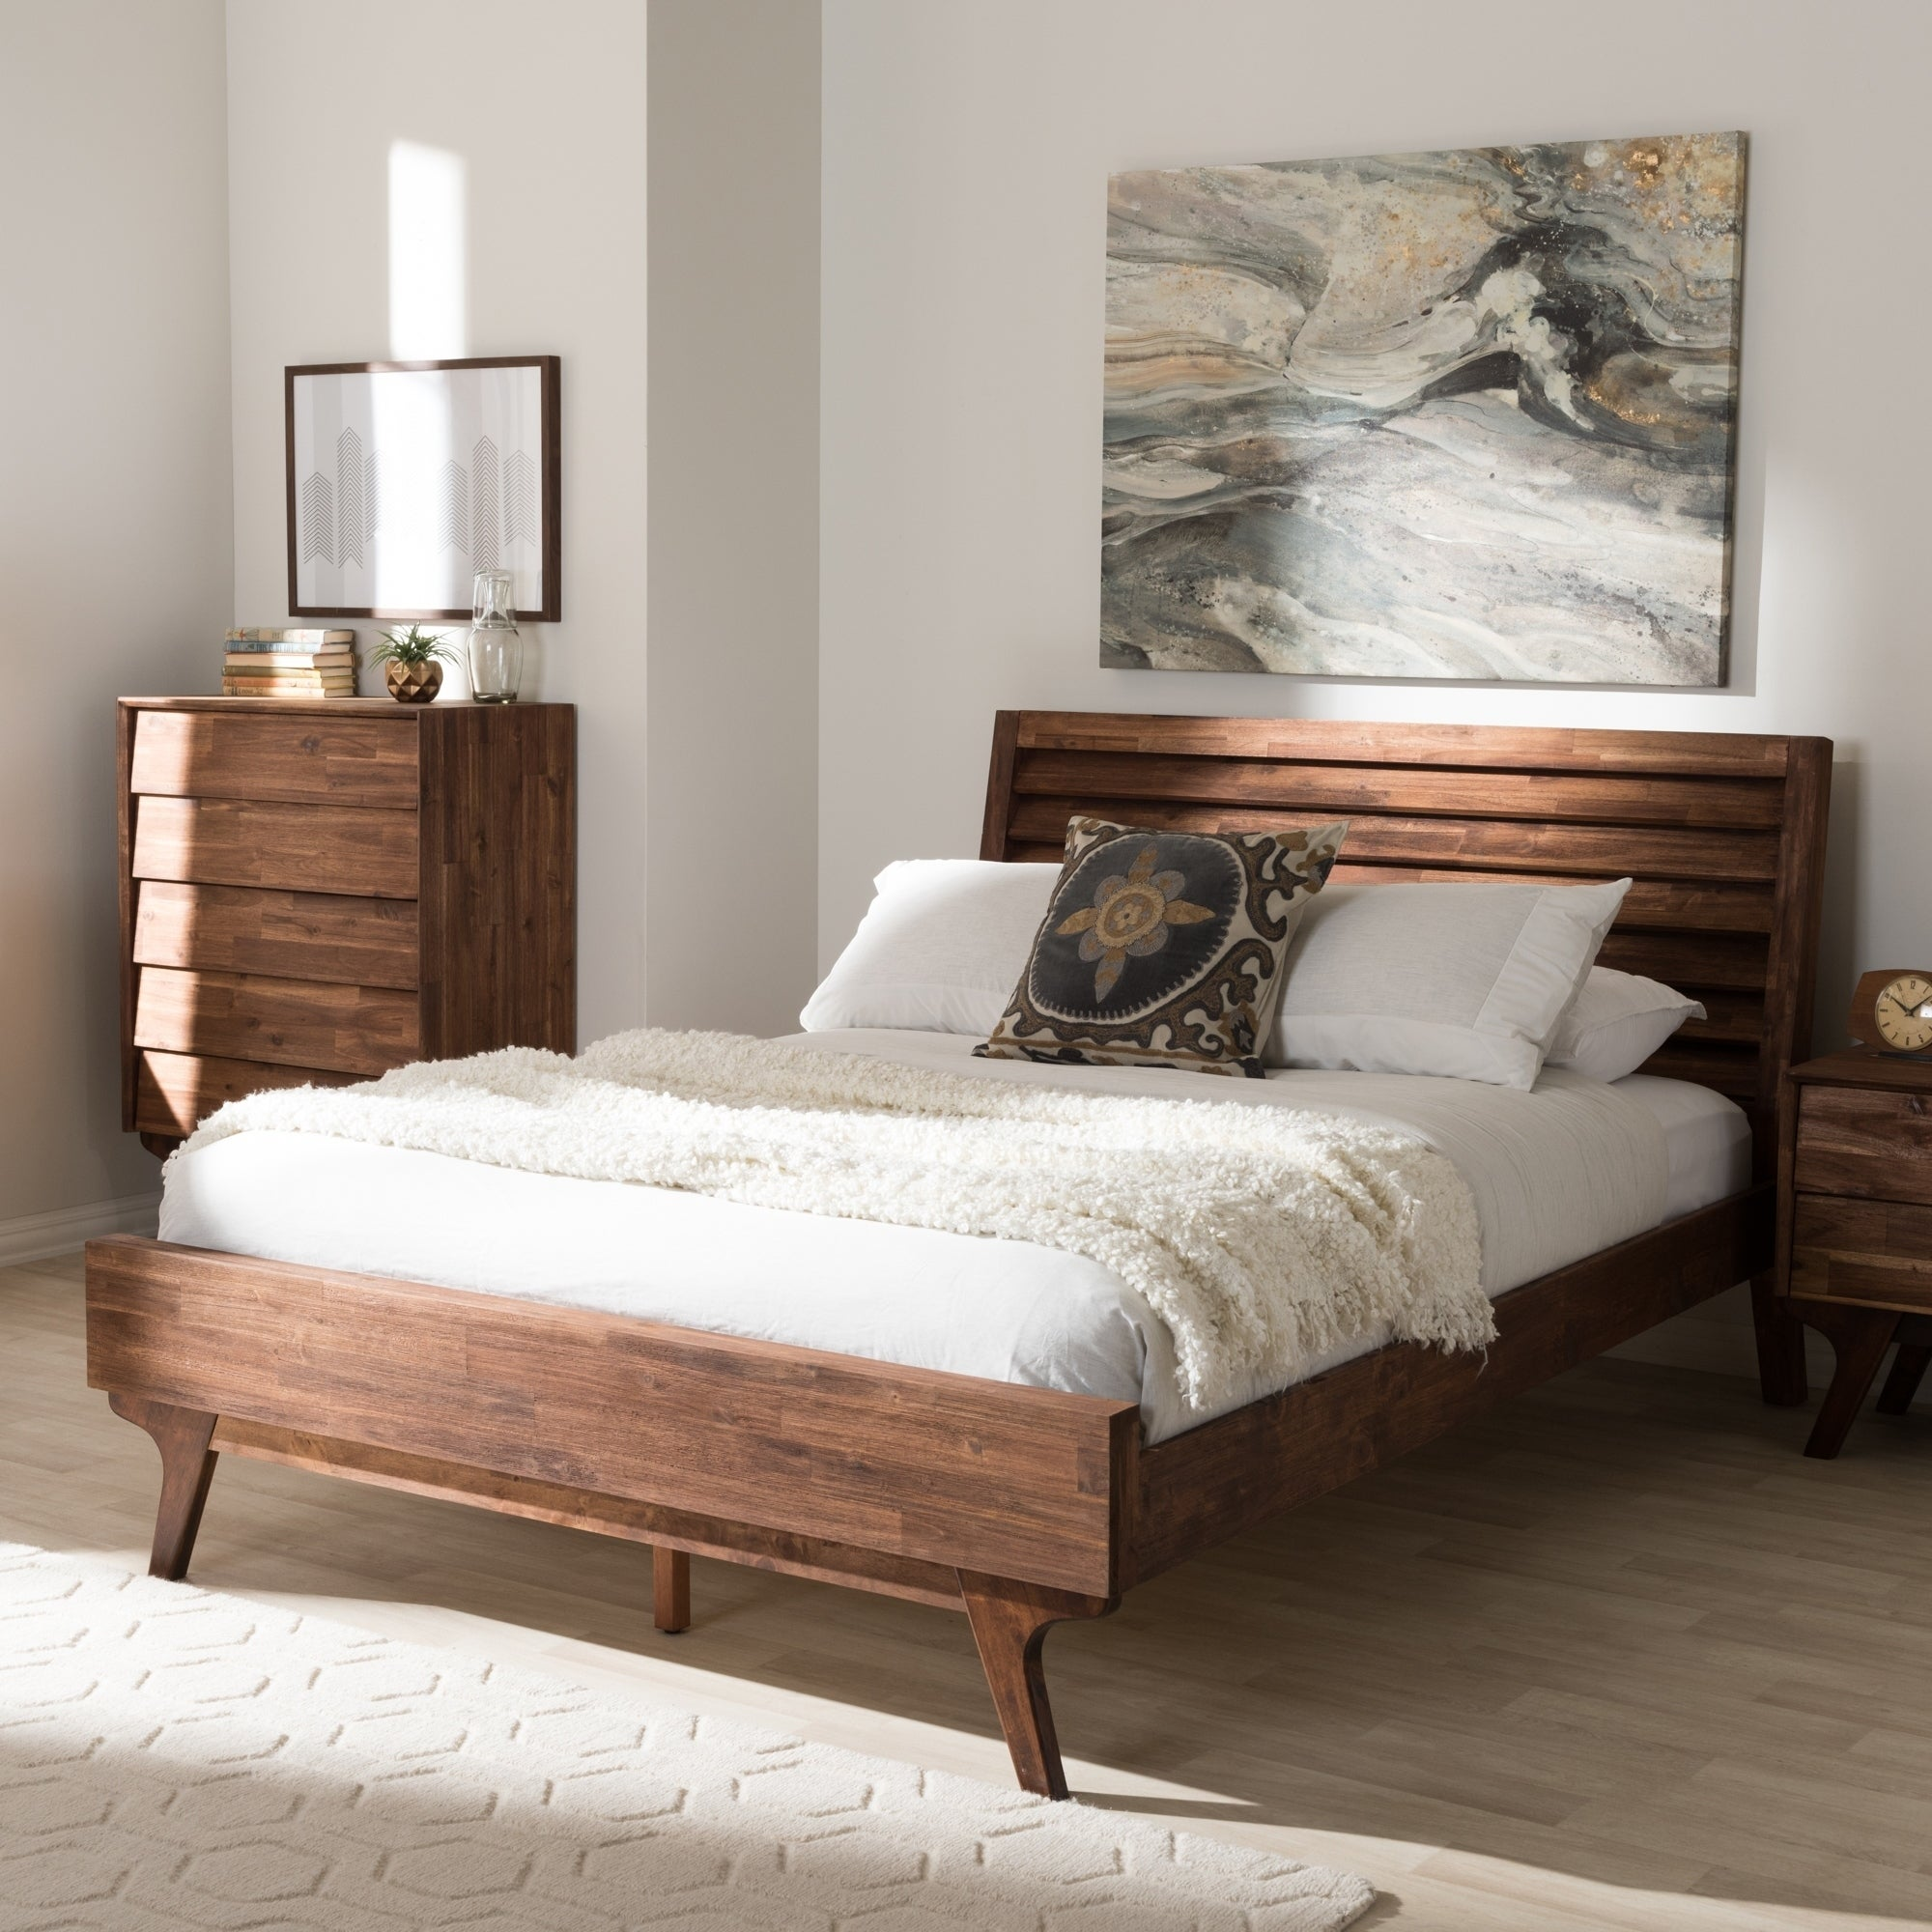 Mid-Century Brown Wood Queen Size Platform Bed by Baxton Studio ...